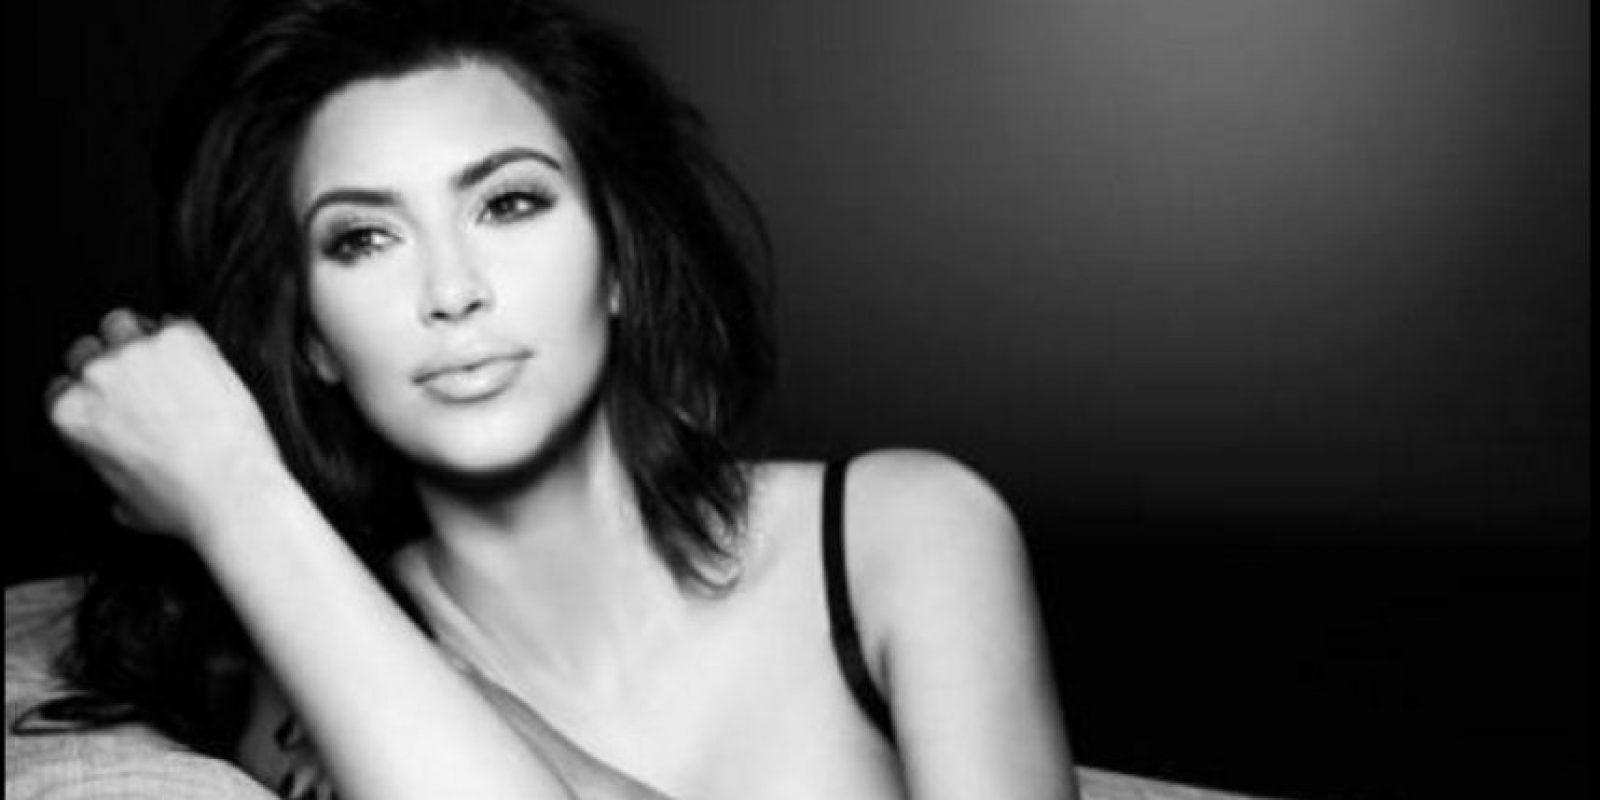 6- Kim Kardashian, socialité estadounidense. Foto:facebook.com/KimKardashian